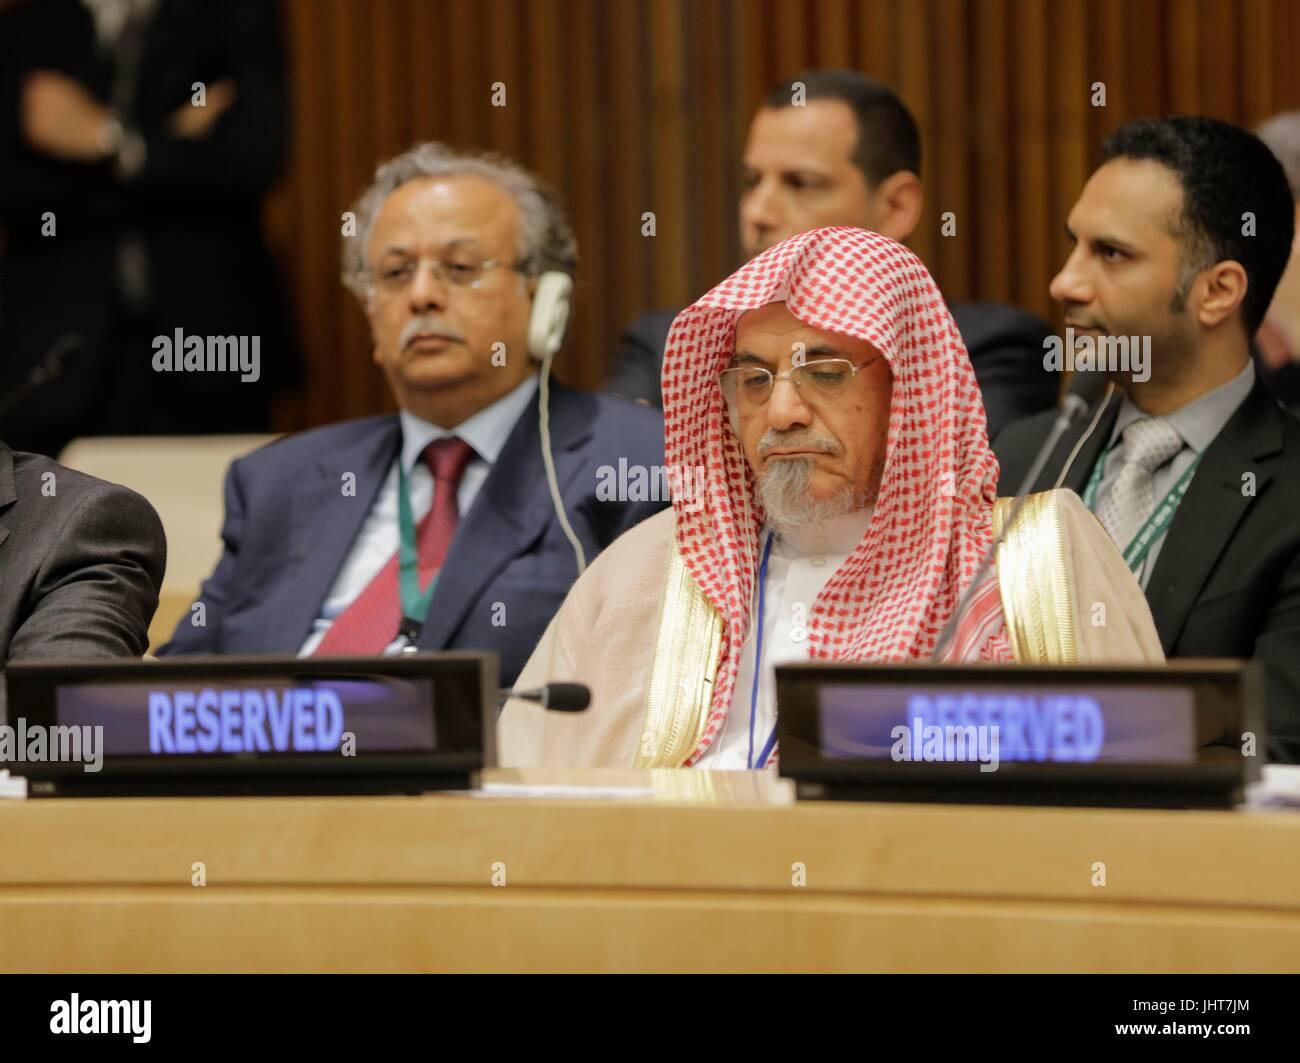 Humaid Abdulla Saleh